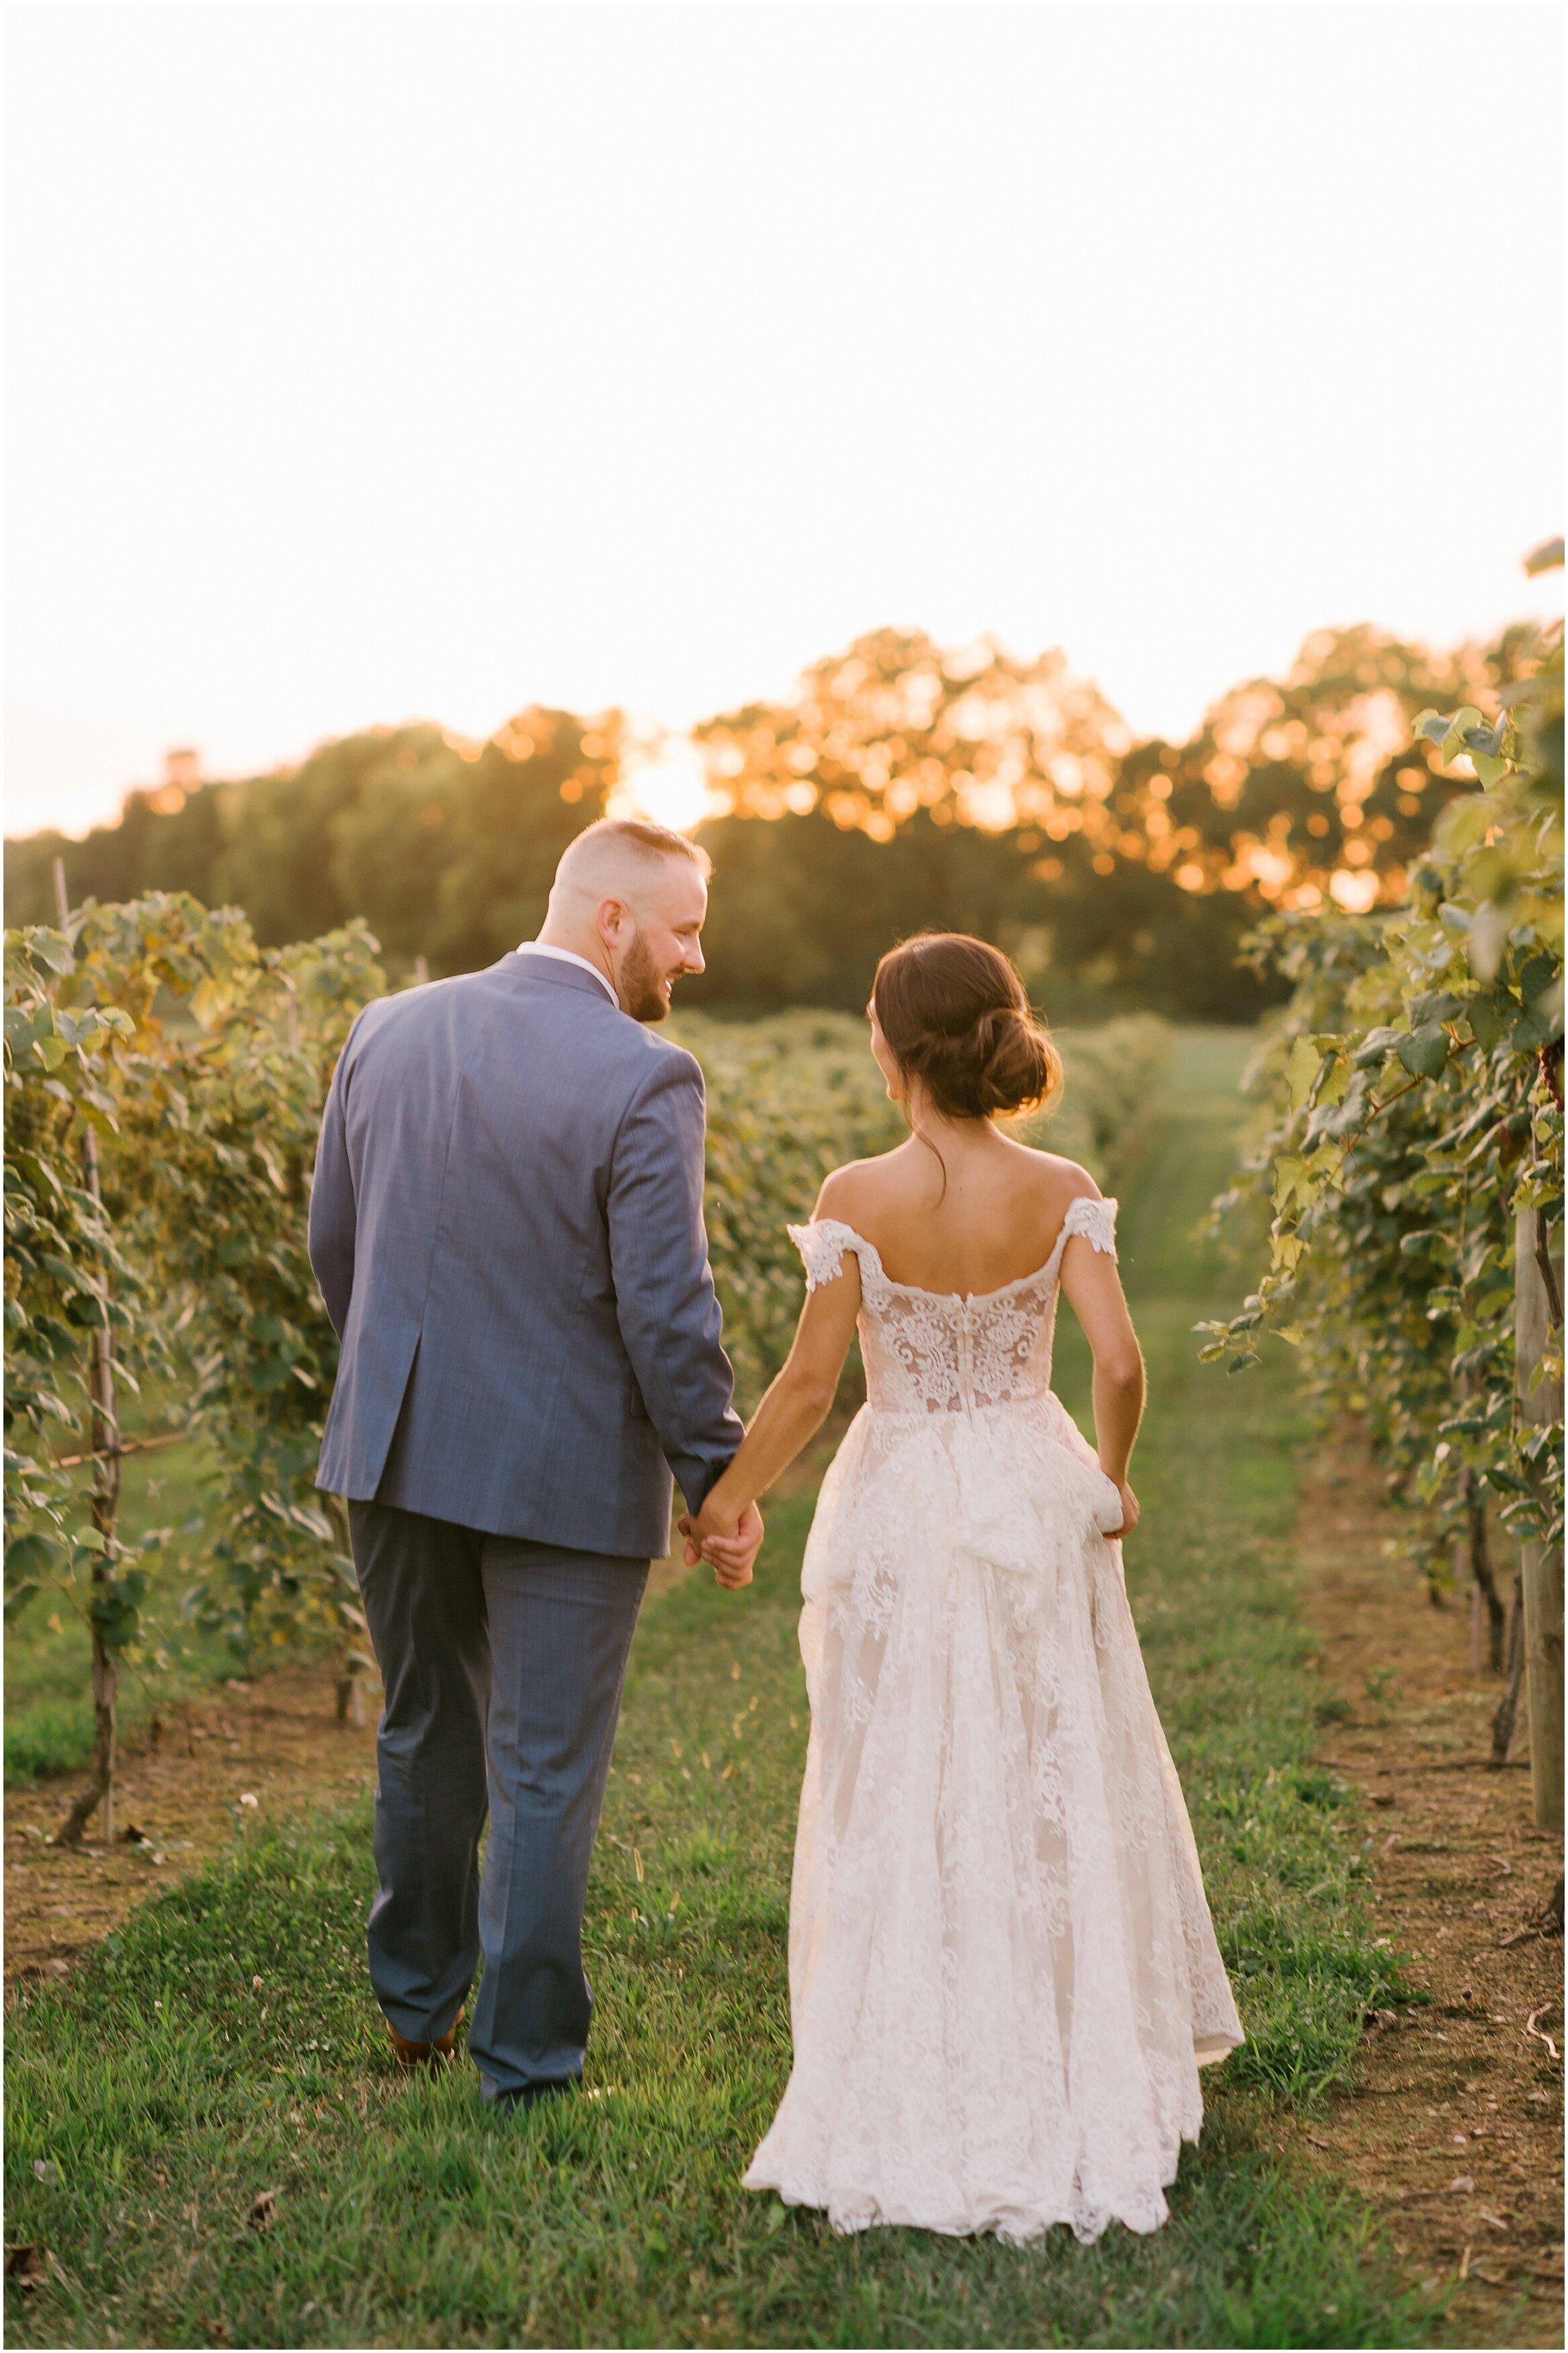 Rebecca Shehorn Photography Indianapolis Wedding Photographer Sycamore at Mallow Run_0783.jpg